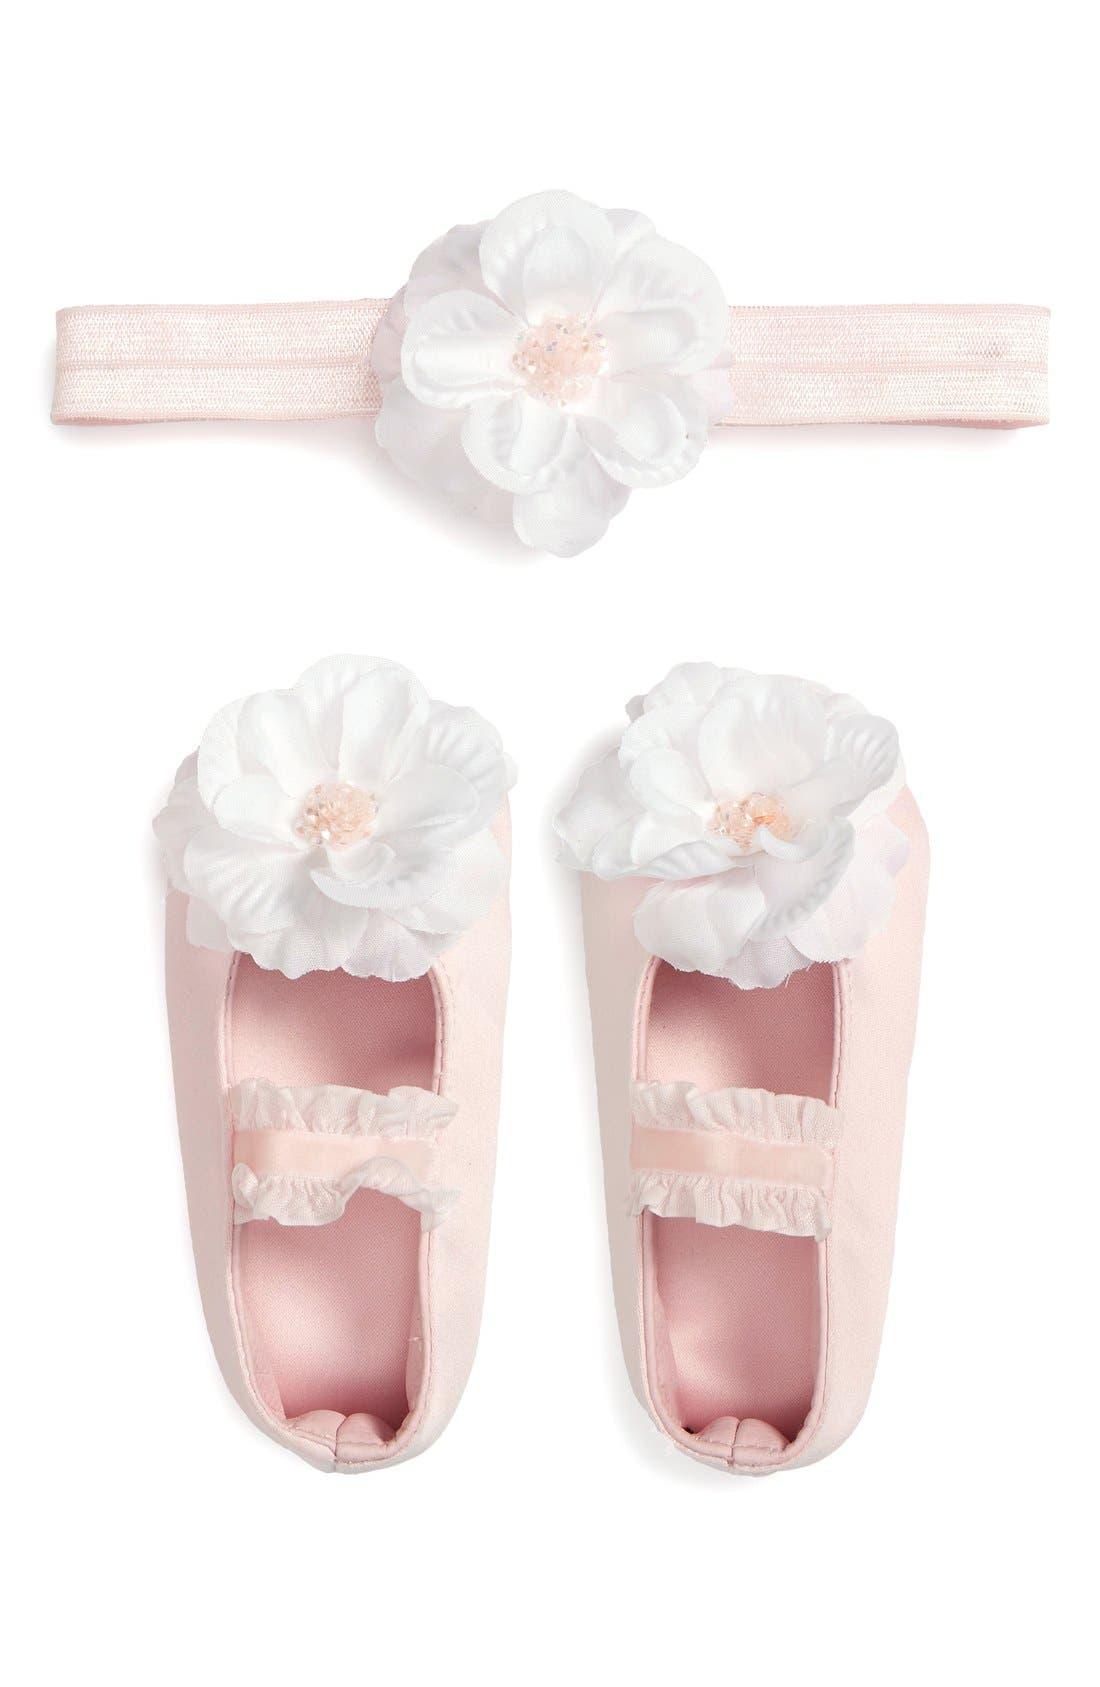 Main Image - PLH Bows & Laces Headband & Shoes Gift Set (Infant)